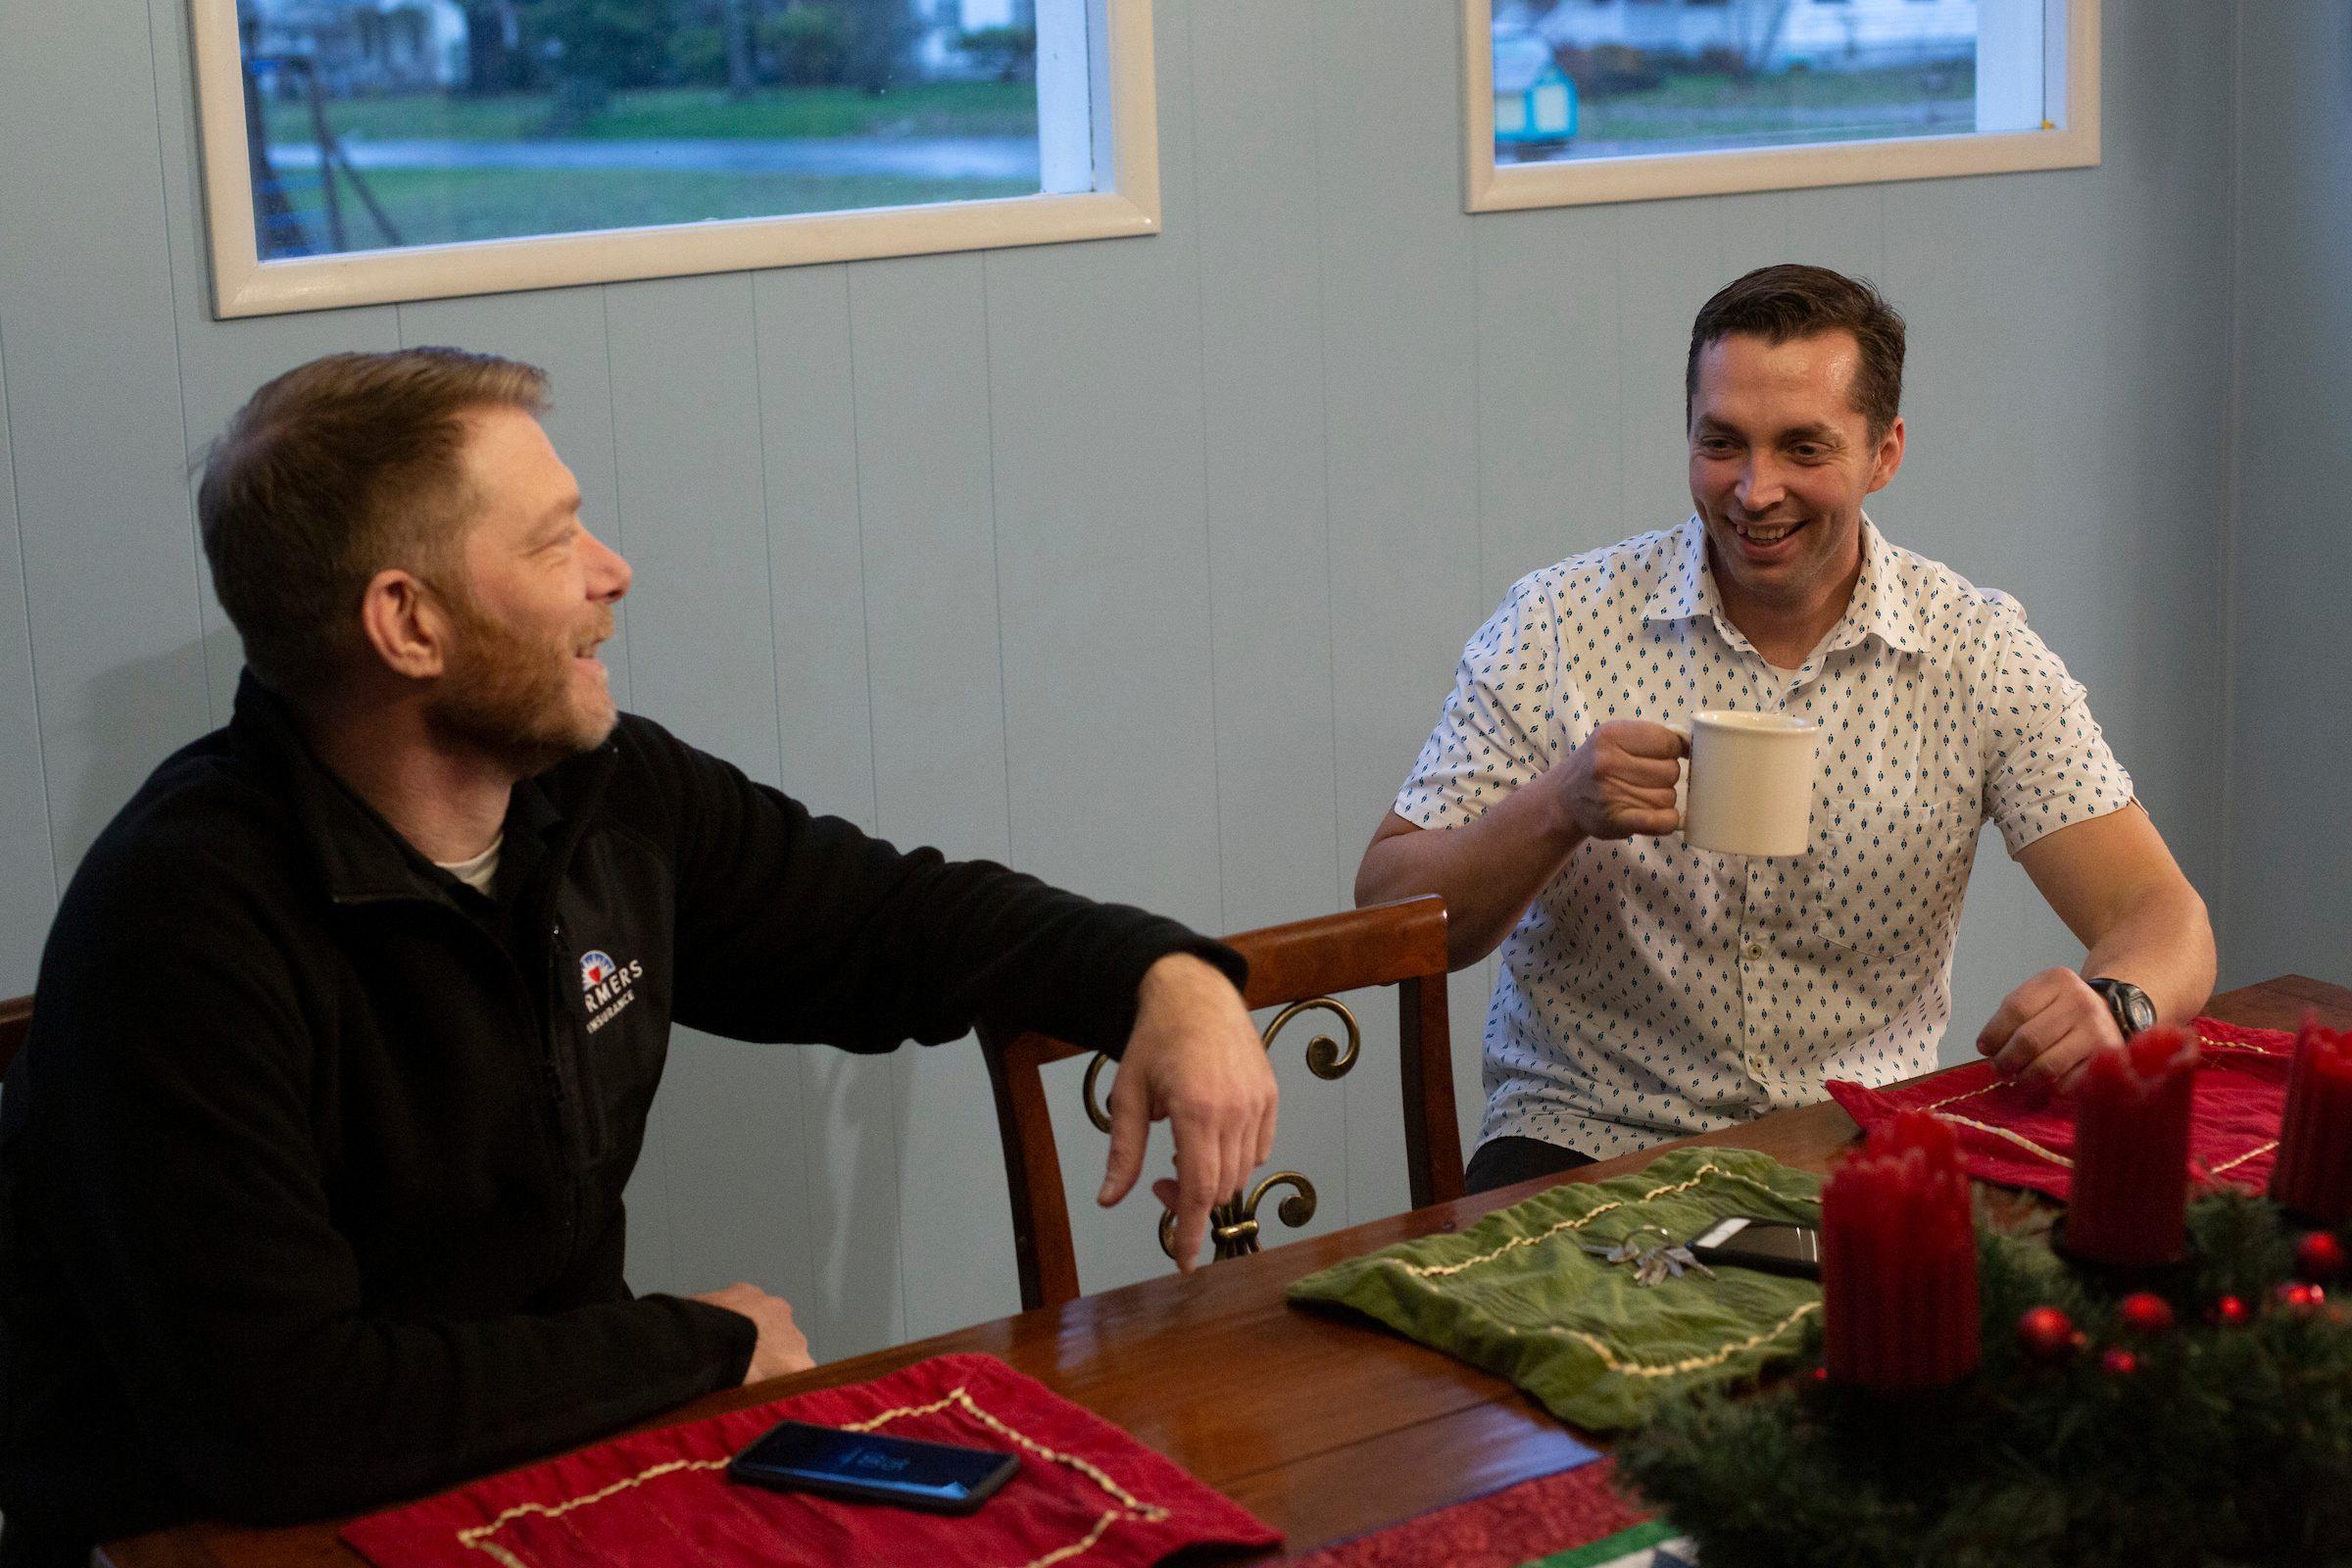 Starbucks regular to get lifesaving kidney from fellow Army vet after barista shares devastating story